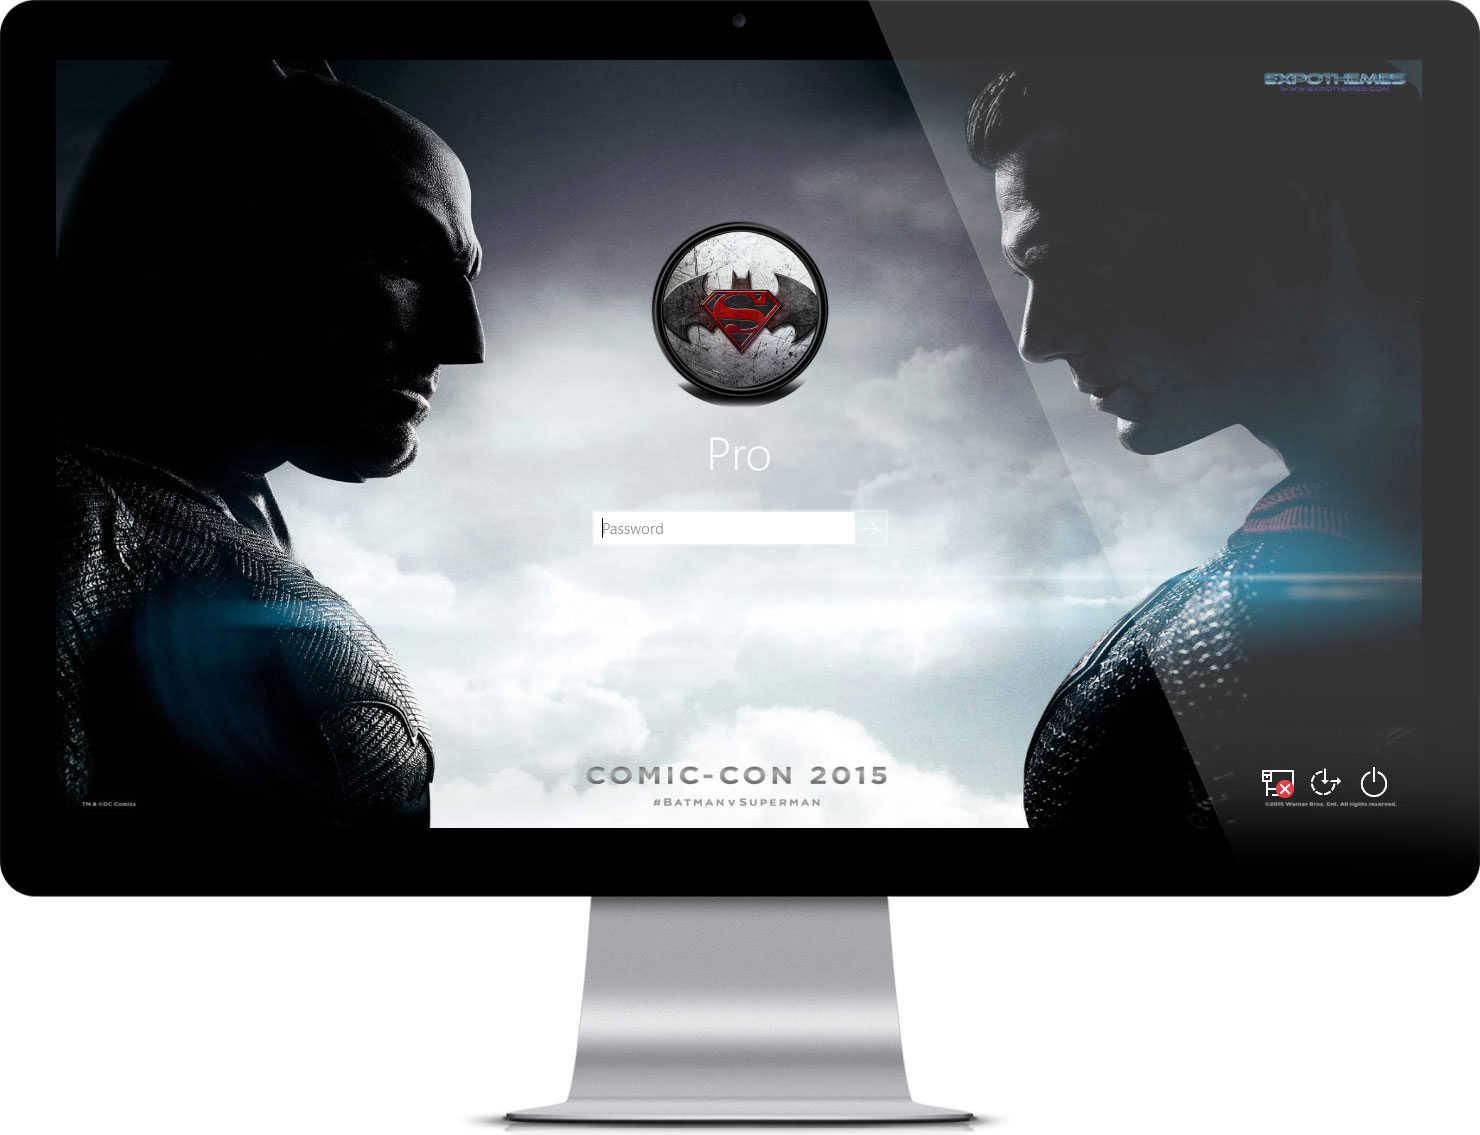 47+] Windows 10 Batman Wallpaper on WallpaperSafari